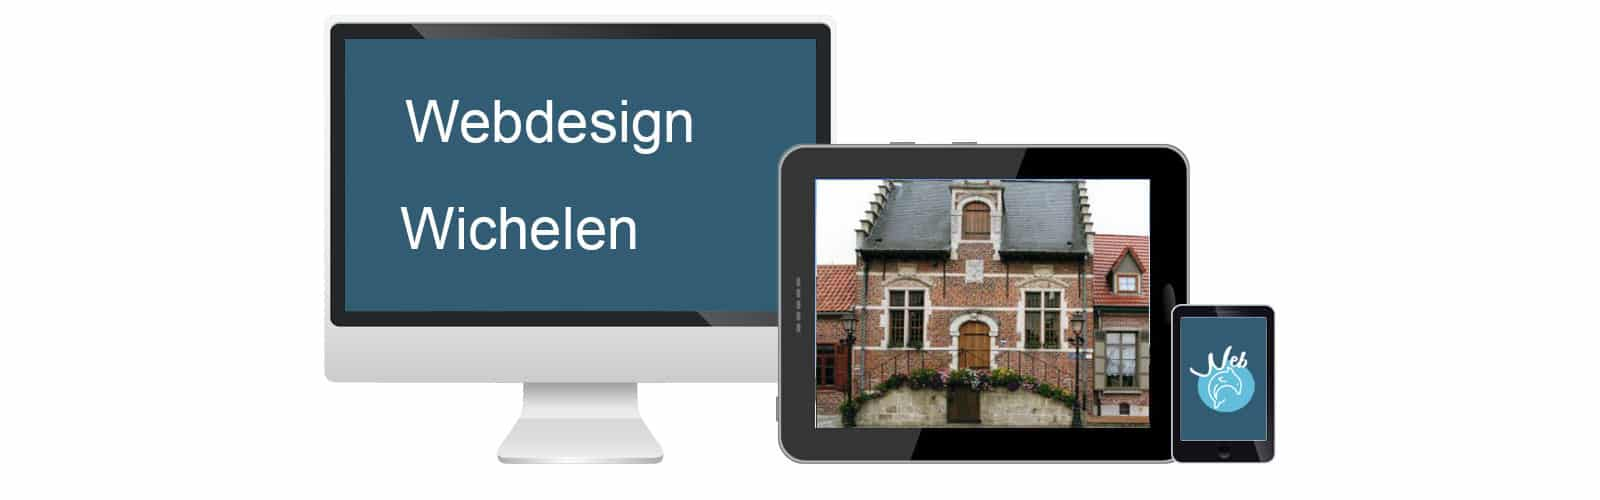 Webdesign Wichelen - webdolfijn